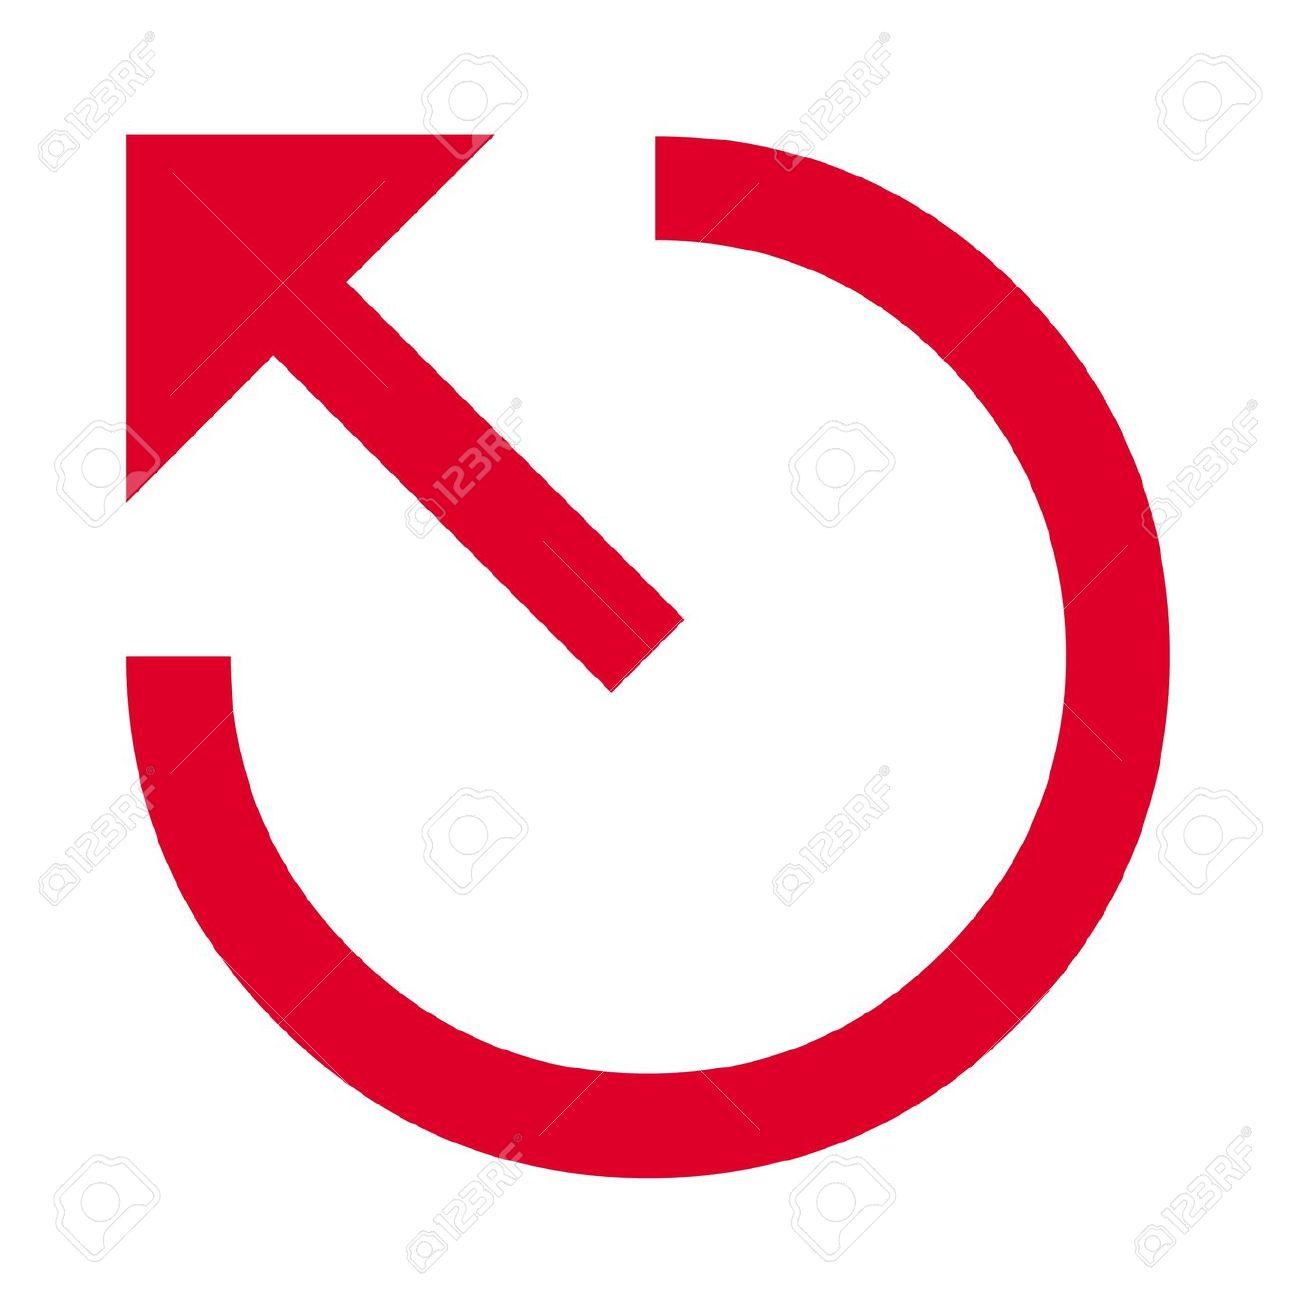 Quarter circle arrow clipart image stock Quarter circle arrow clipart - ClipartFest image stock